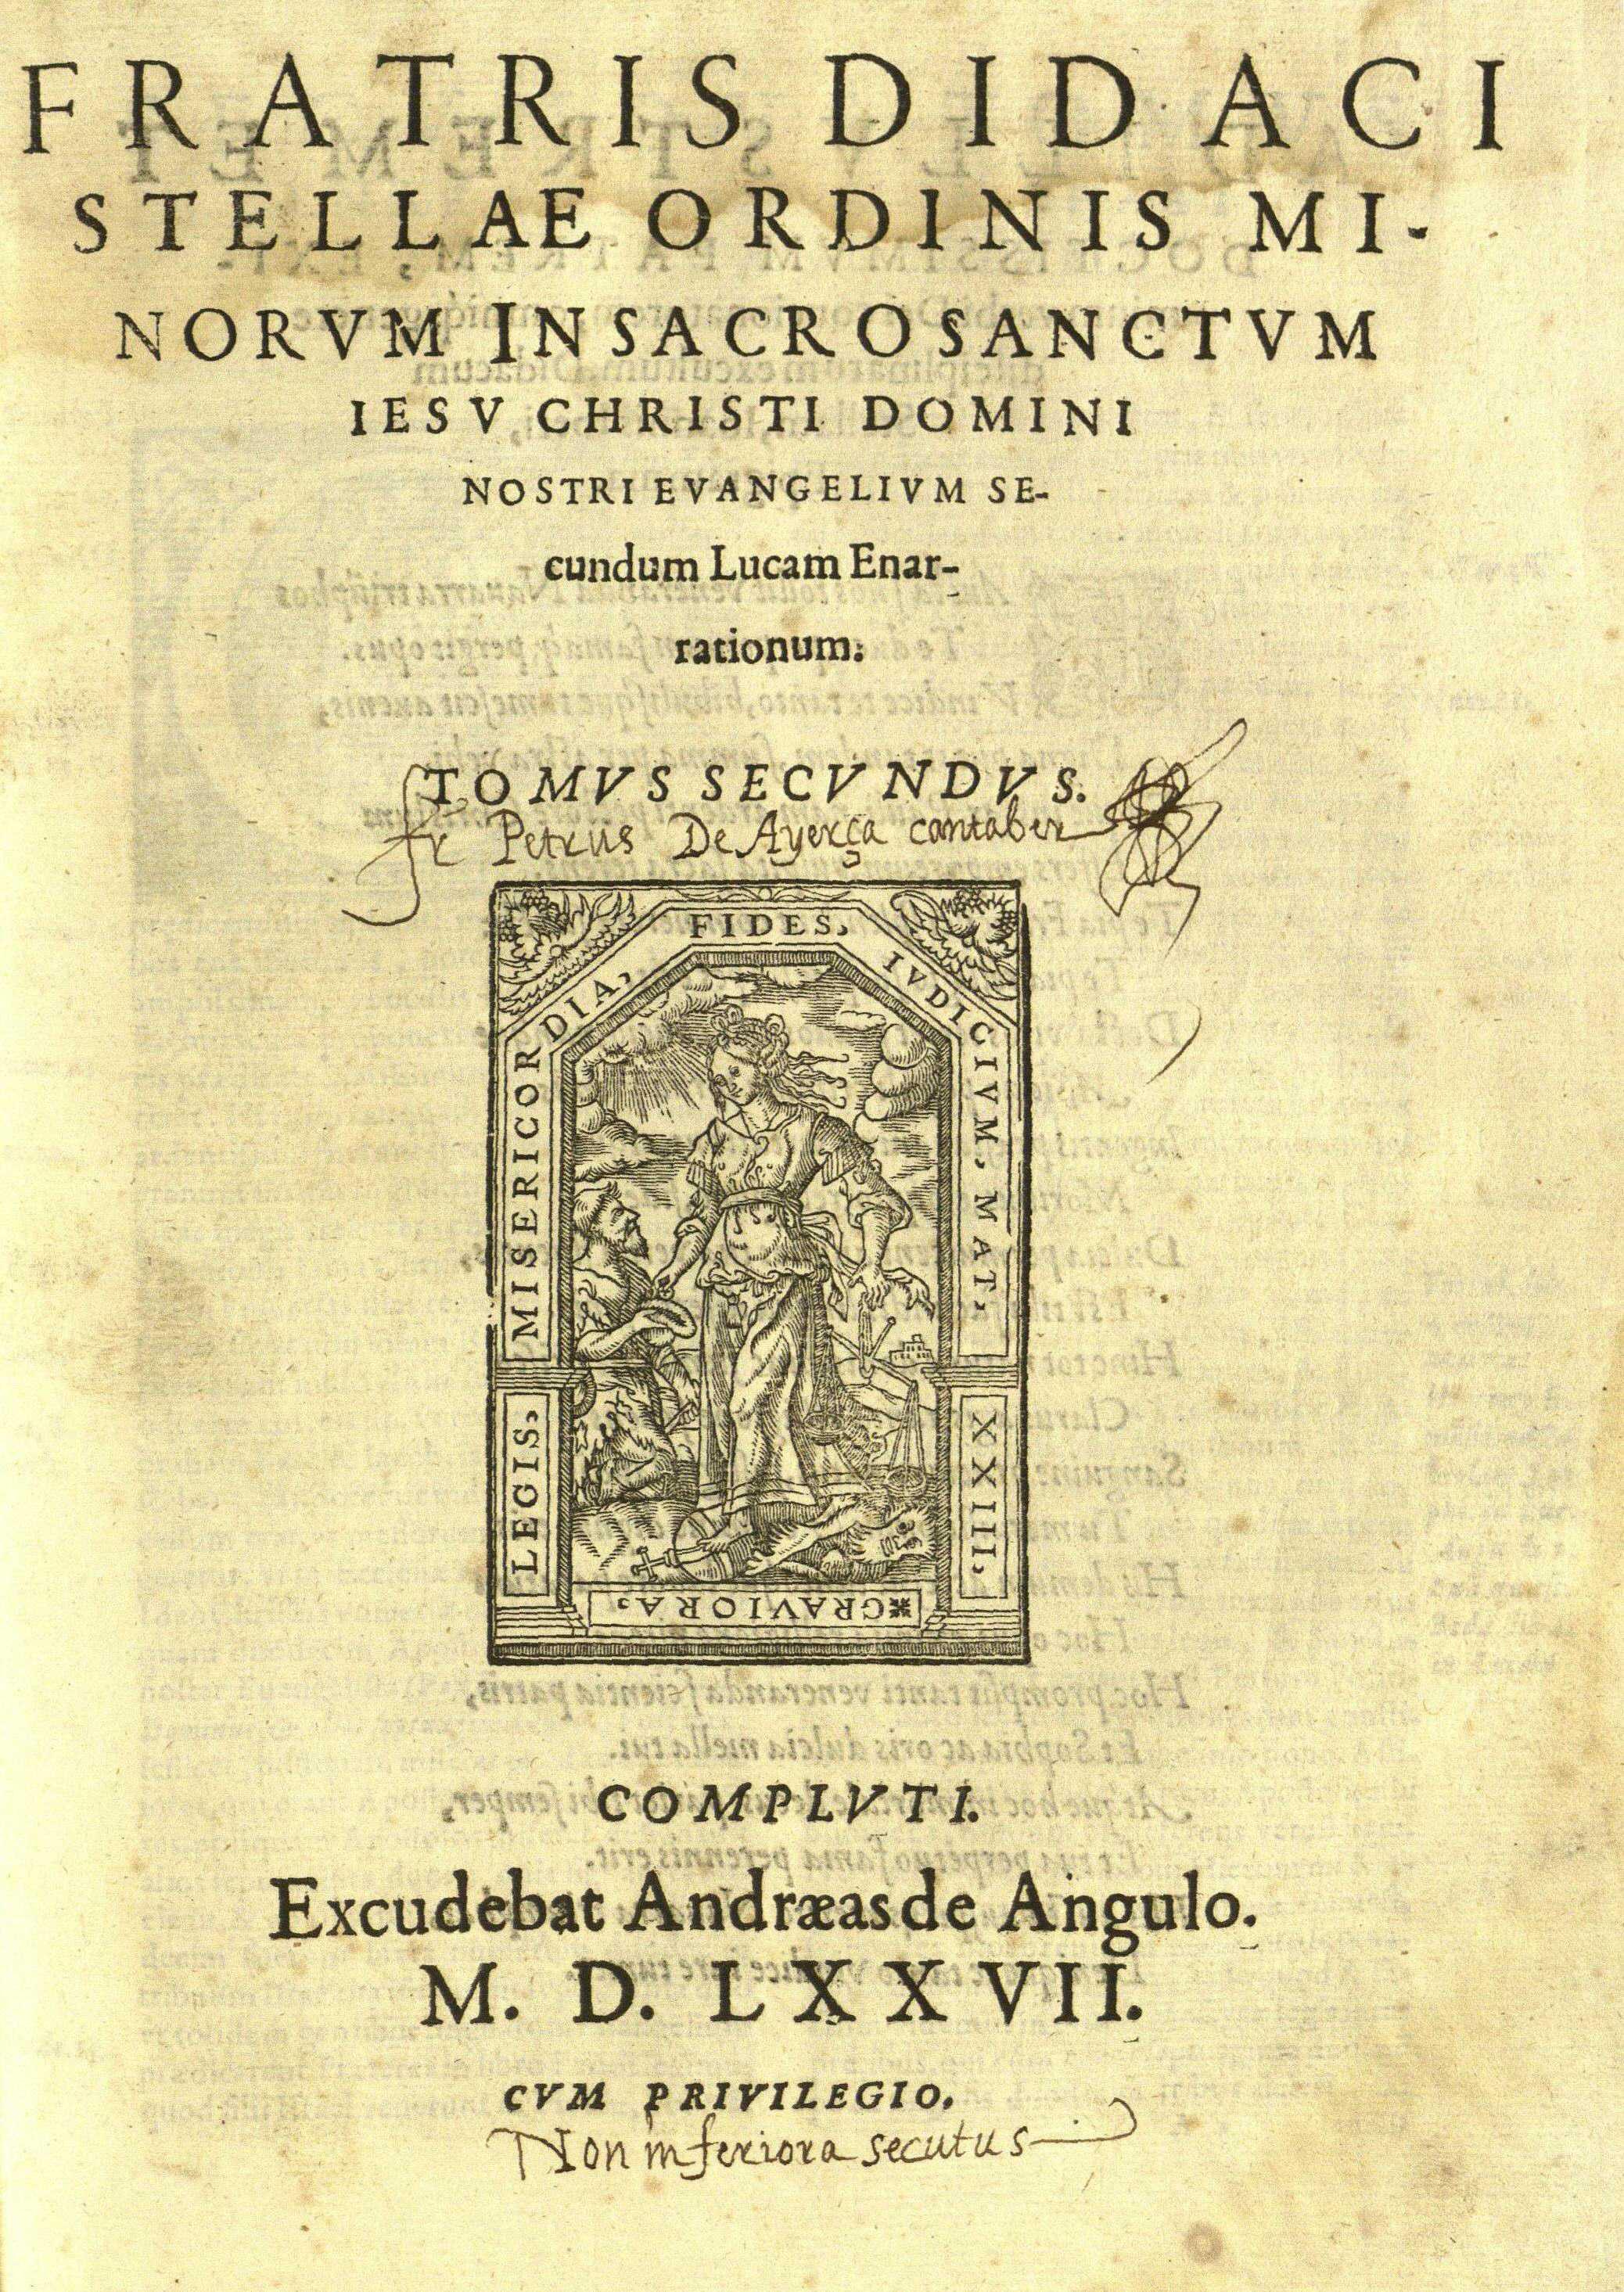 Fratris Didaci Stellae … Tomus secundus, 1577